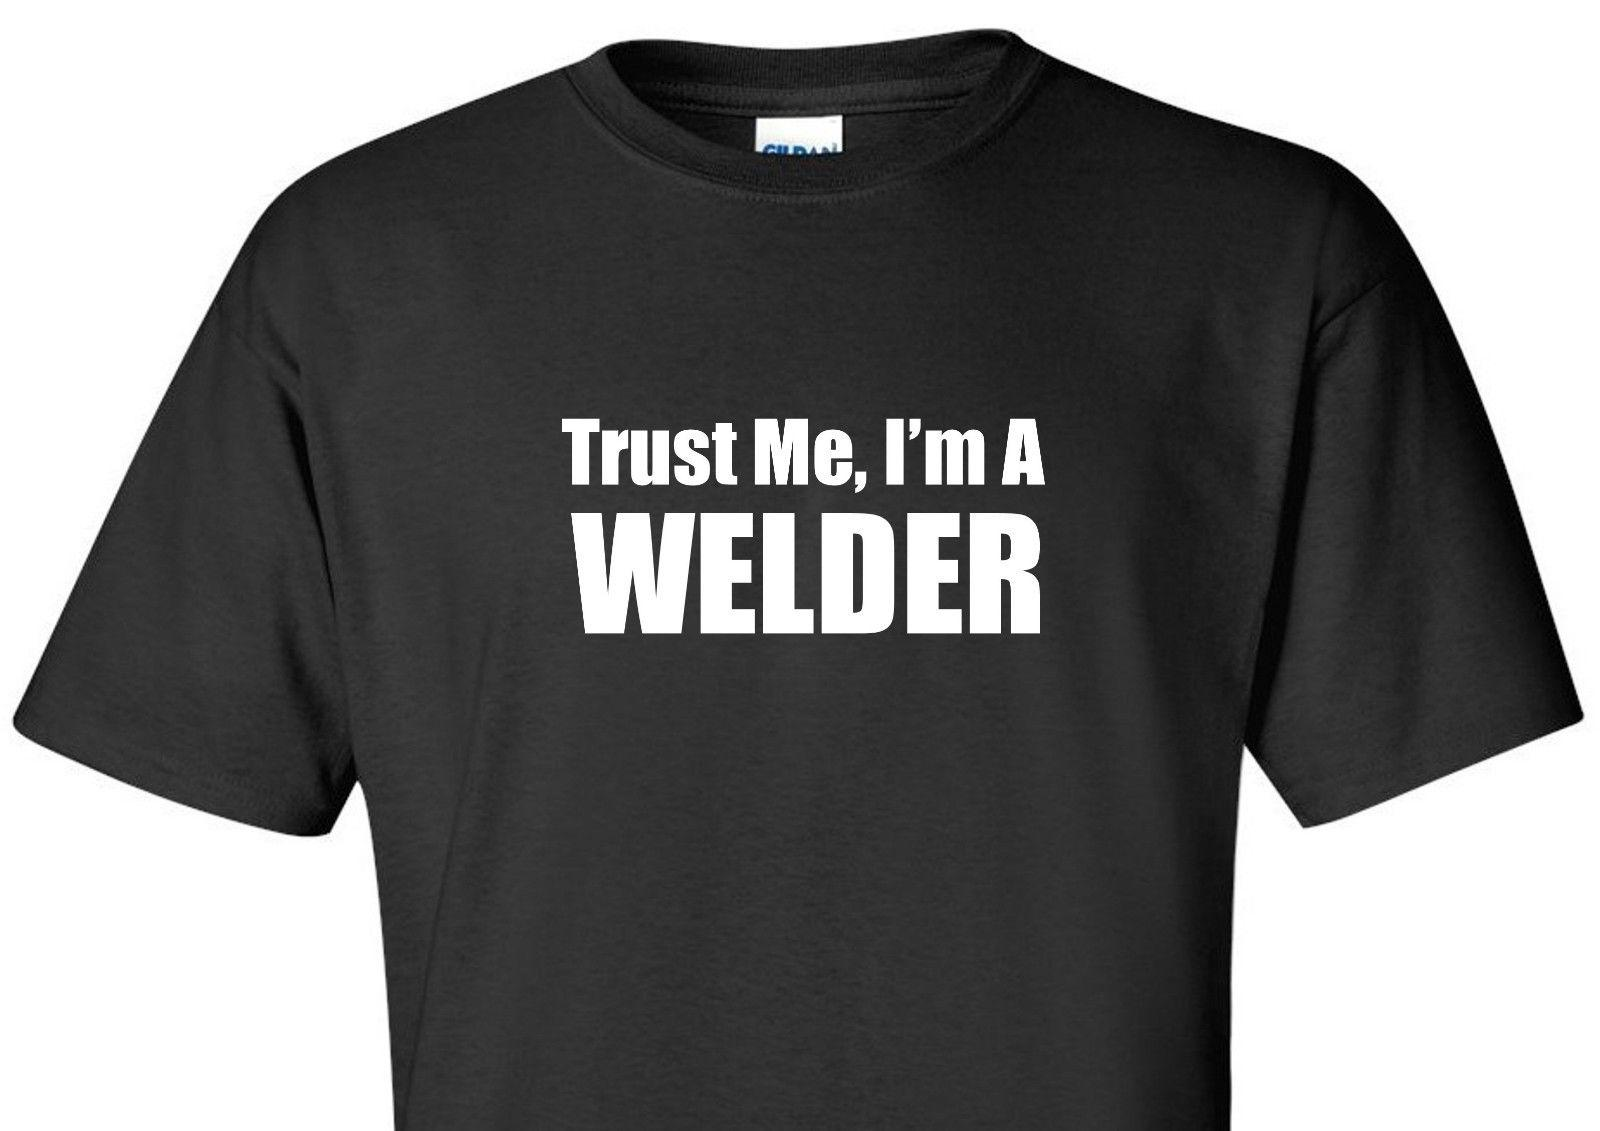 0300c8d19 TRUST ME I'M A WELDER T SHIRT WELDING FABRICATOR FUNNY SHORT SLEEVE BLACK  SHIRT Classic Quality High T Shirt Crazy T Shirt Sayings Tee Shirt Shop  Online ...